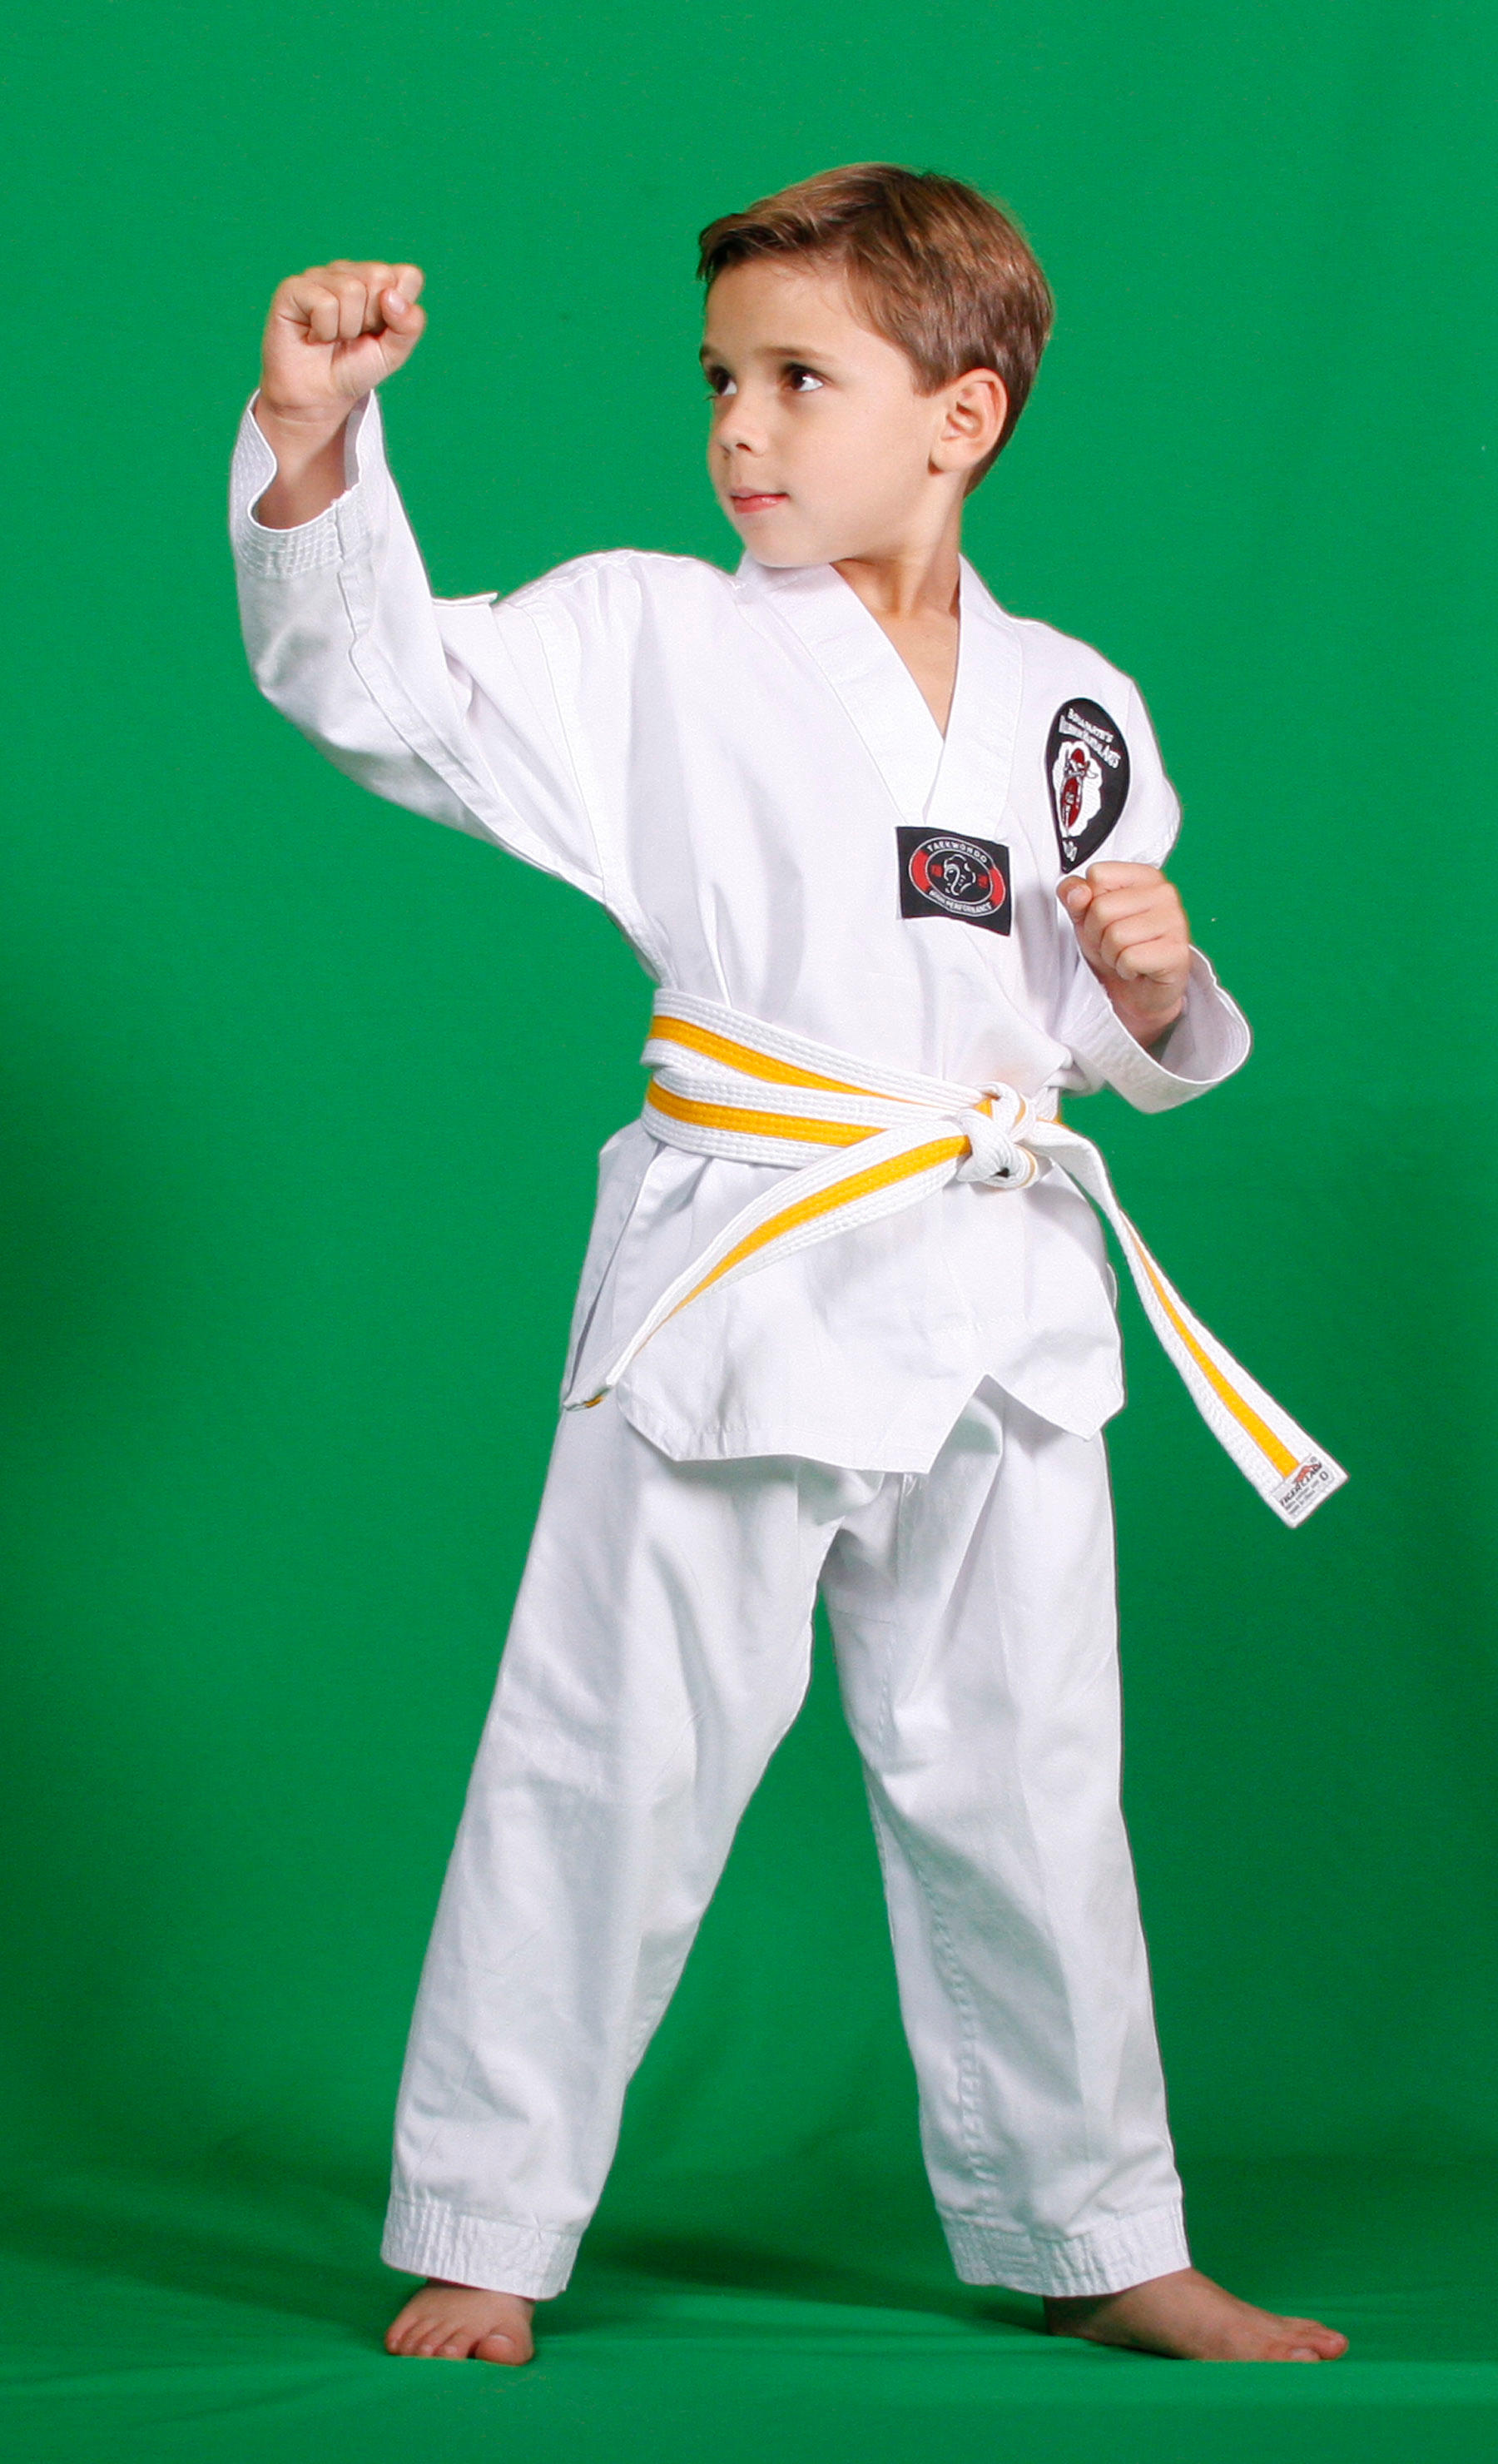 Millennium Martial Arts - Tae Kwon Do image 1